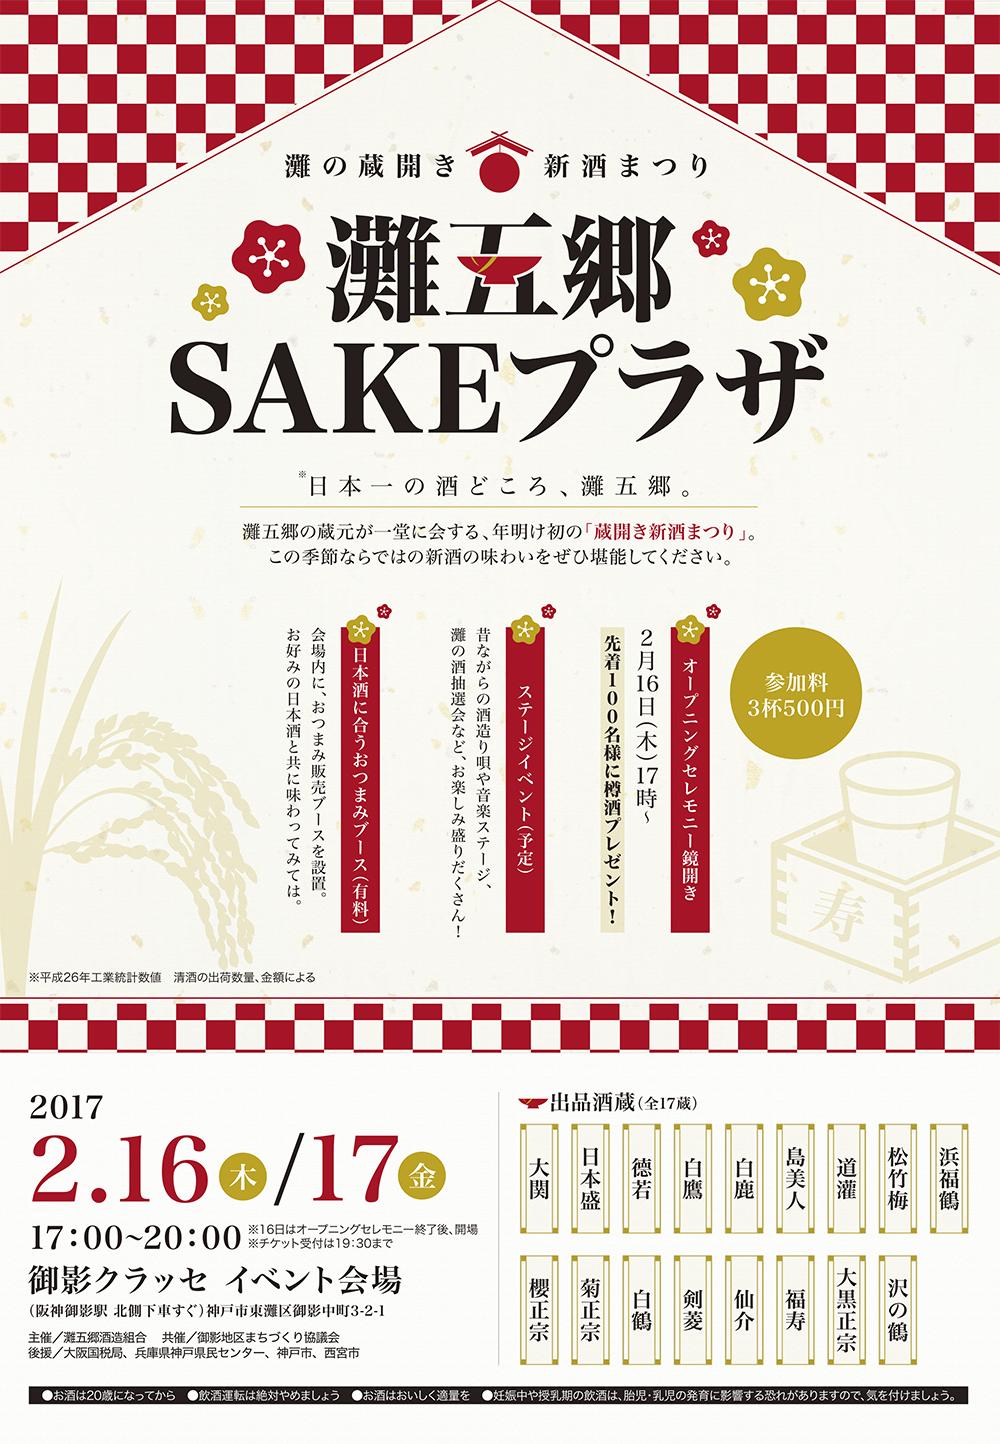 http://www.hakushika.co.jp/topics/images/2017nadagogosakeplaza_poster.jpg